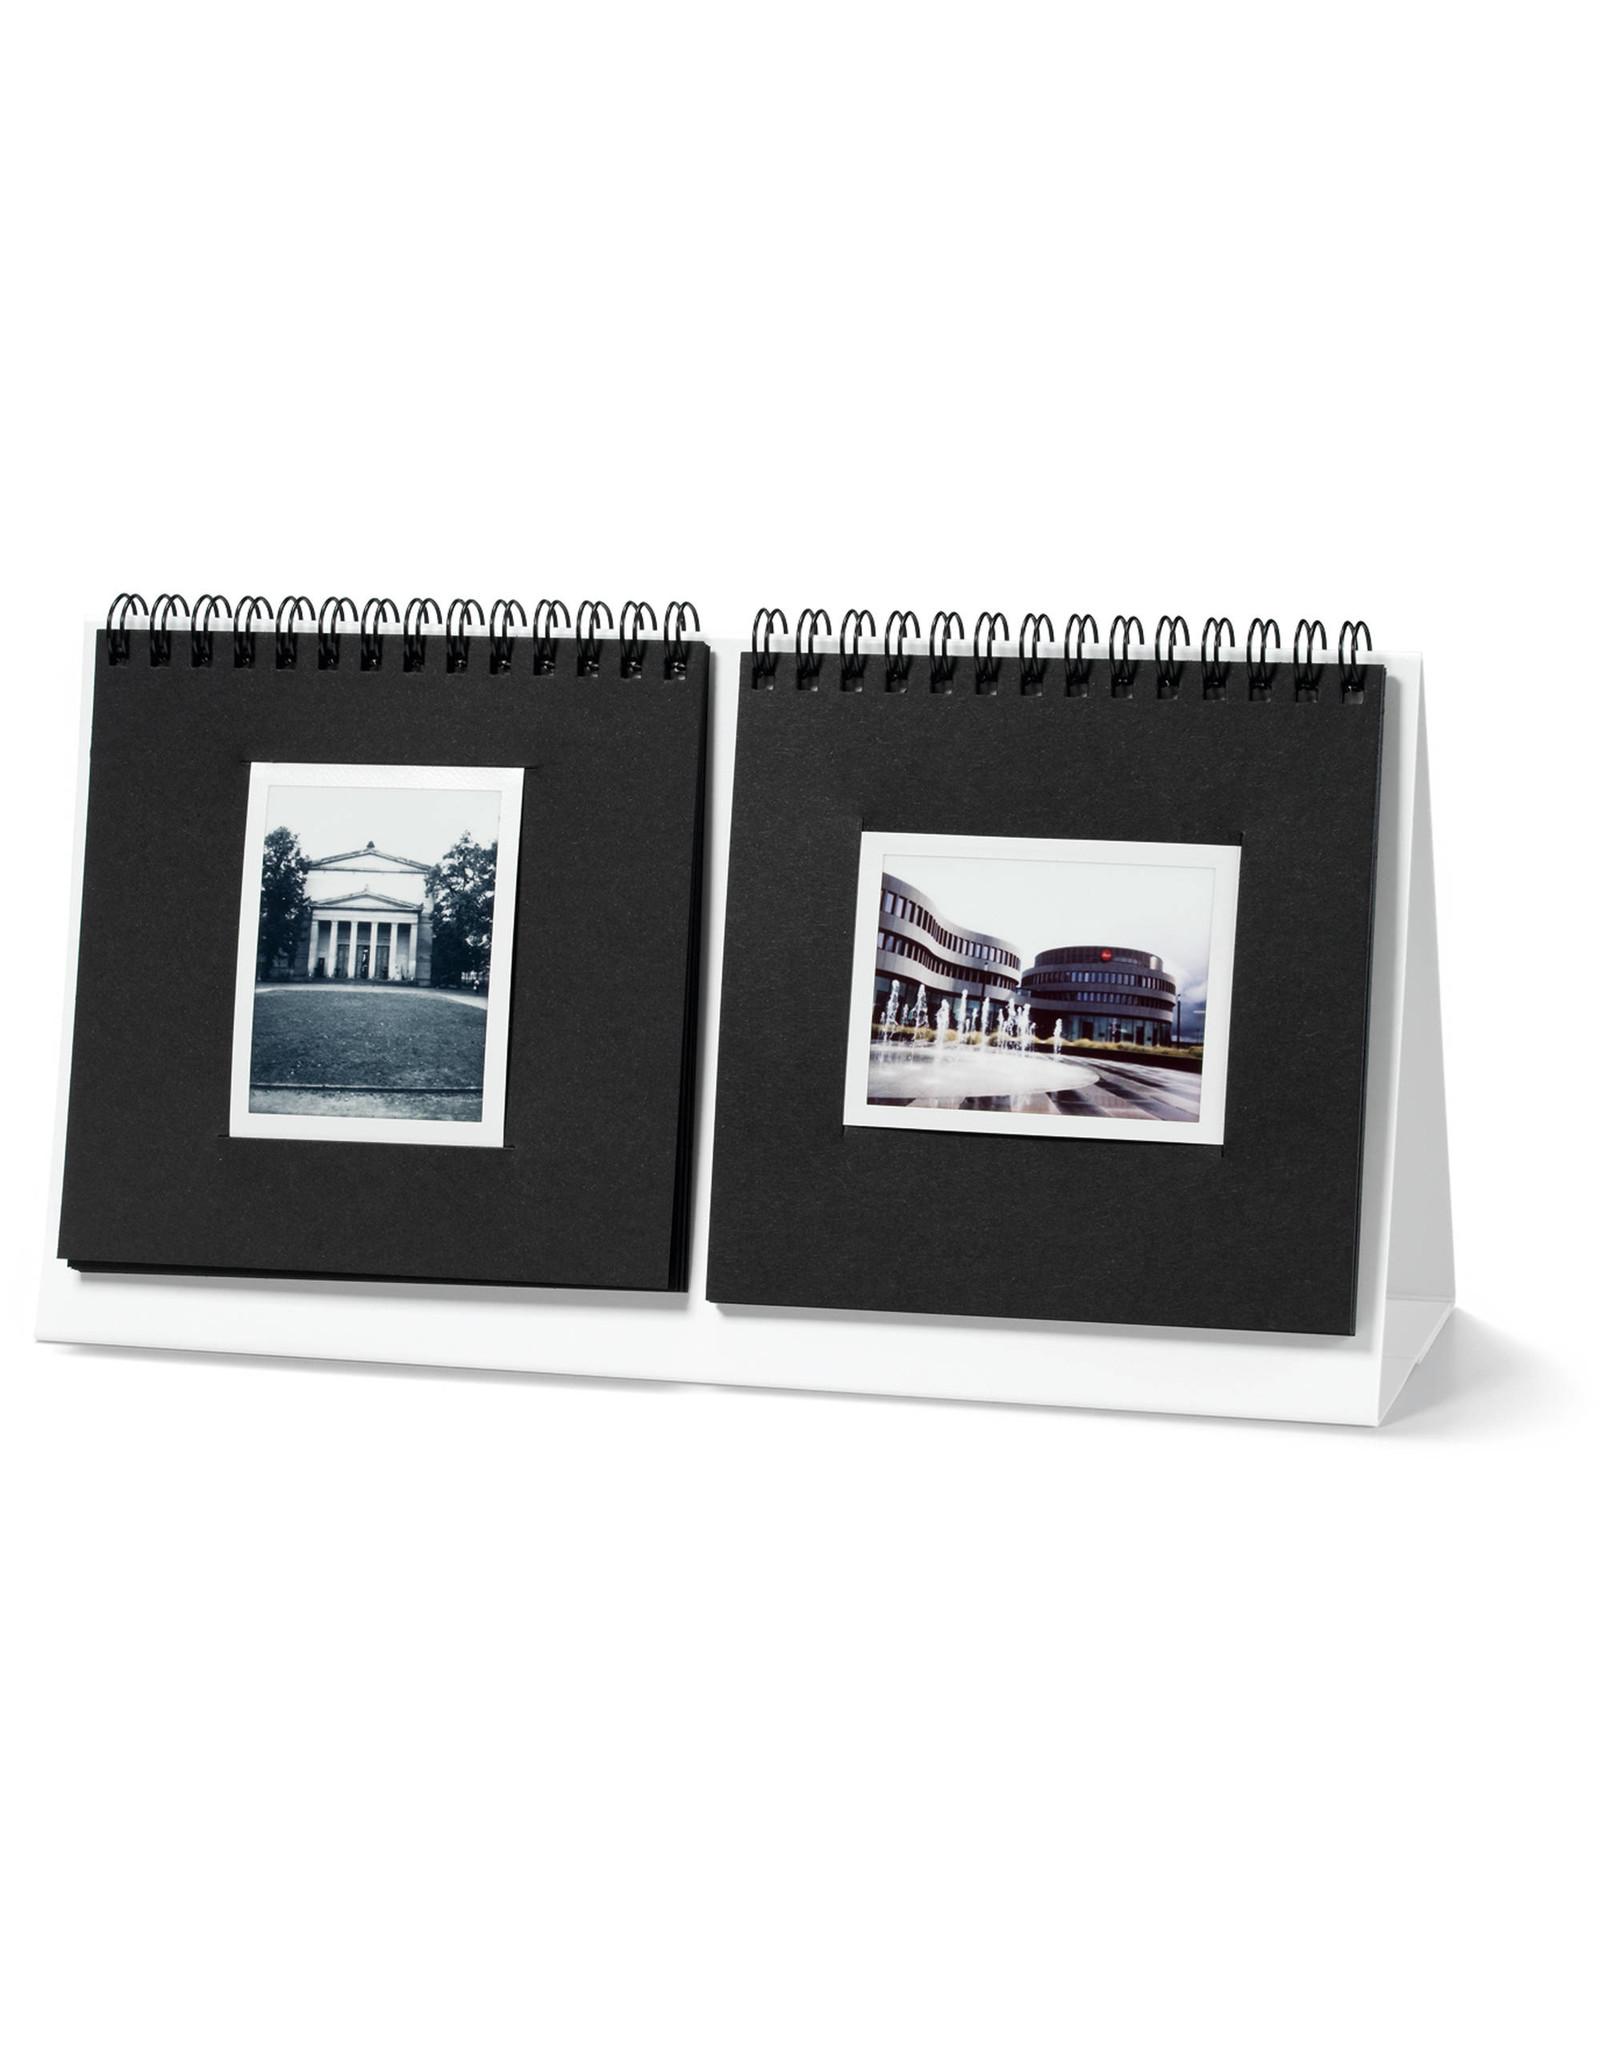 Leica Leica SOFORT Photo Stand   195-18